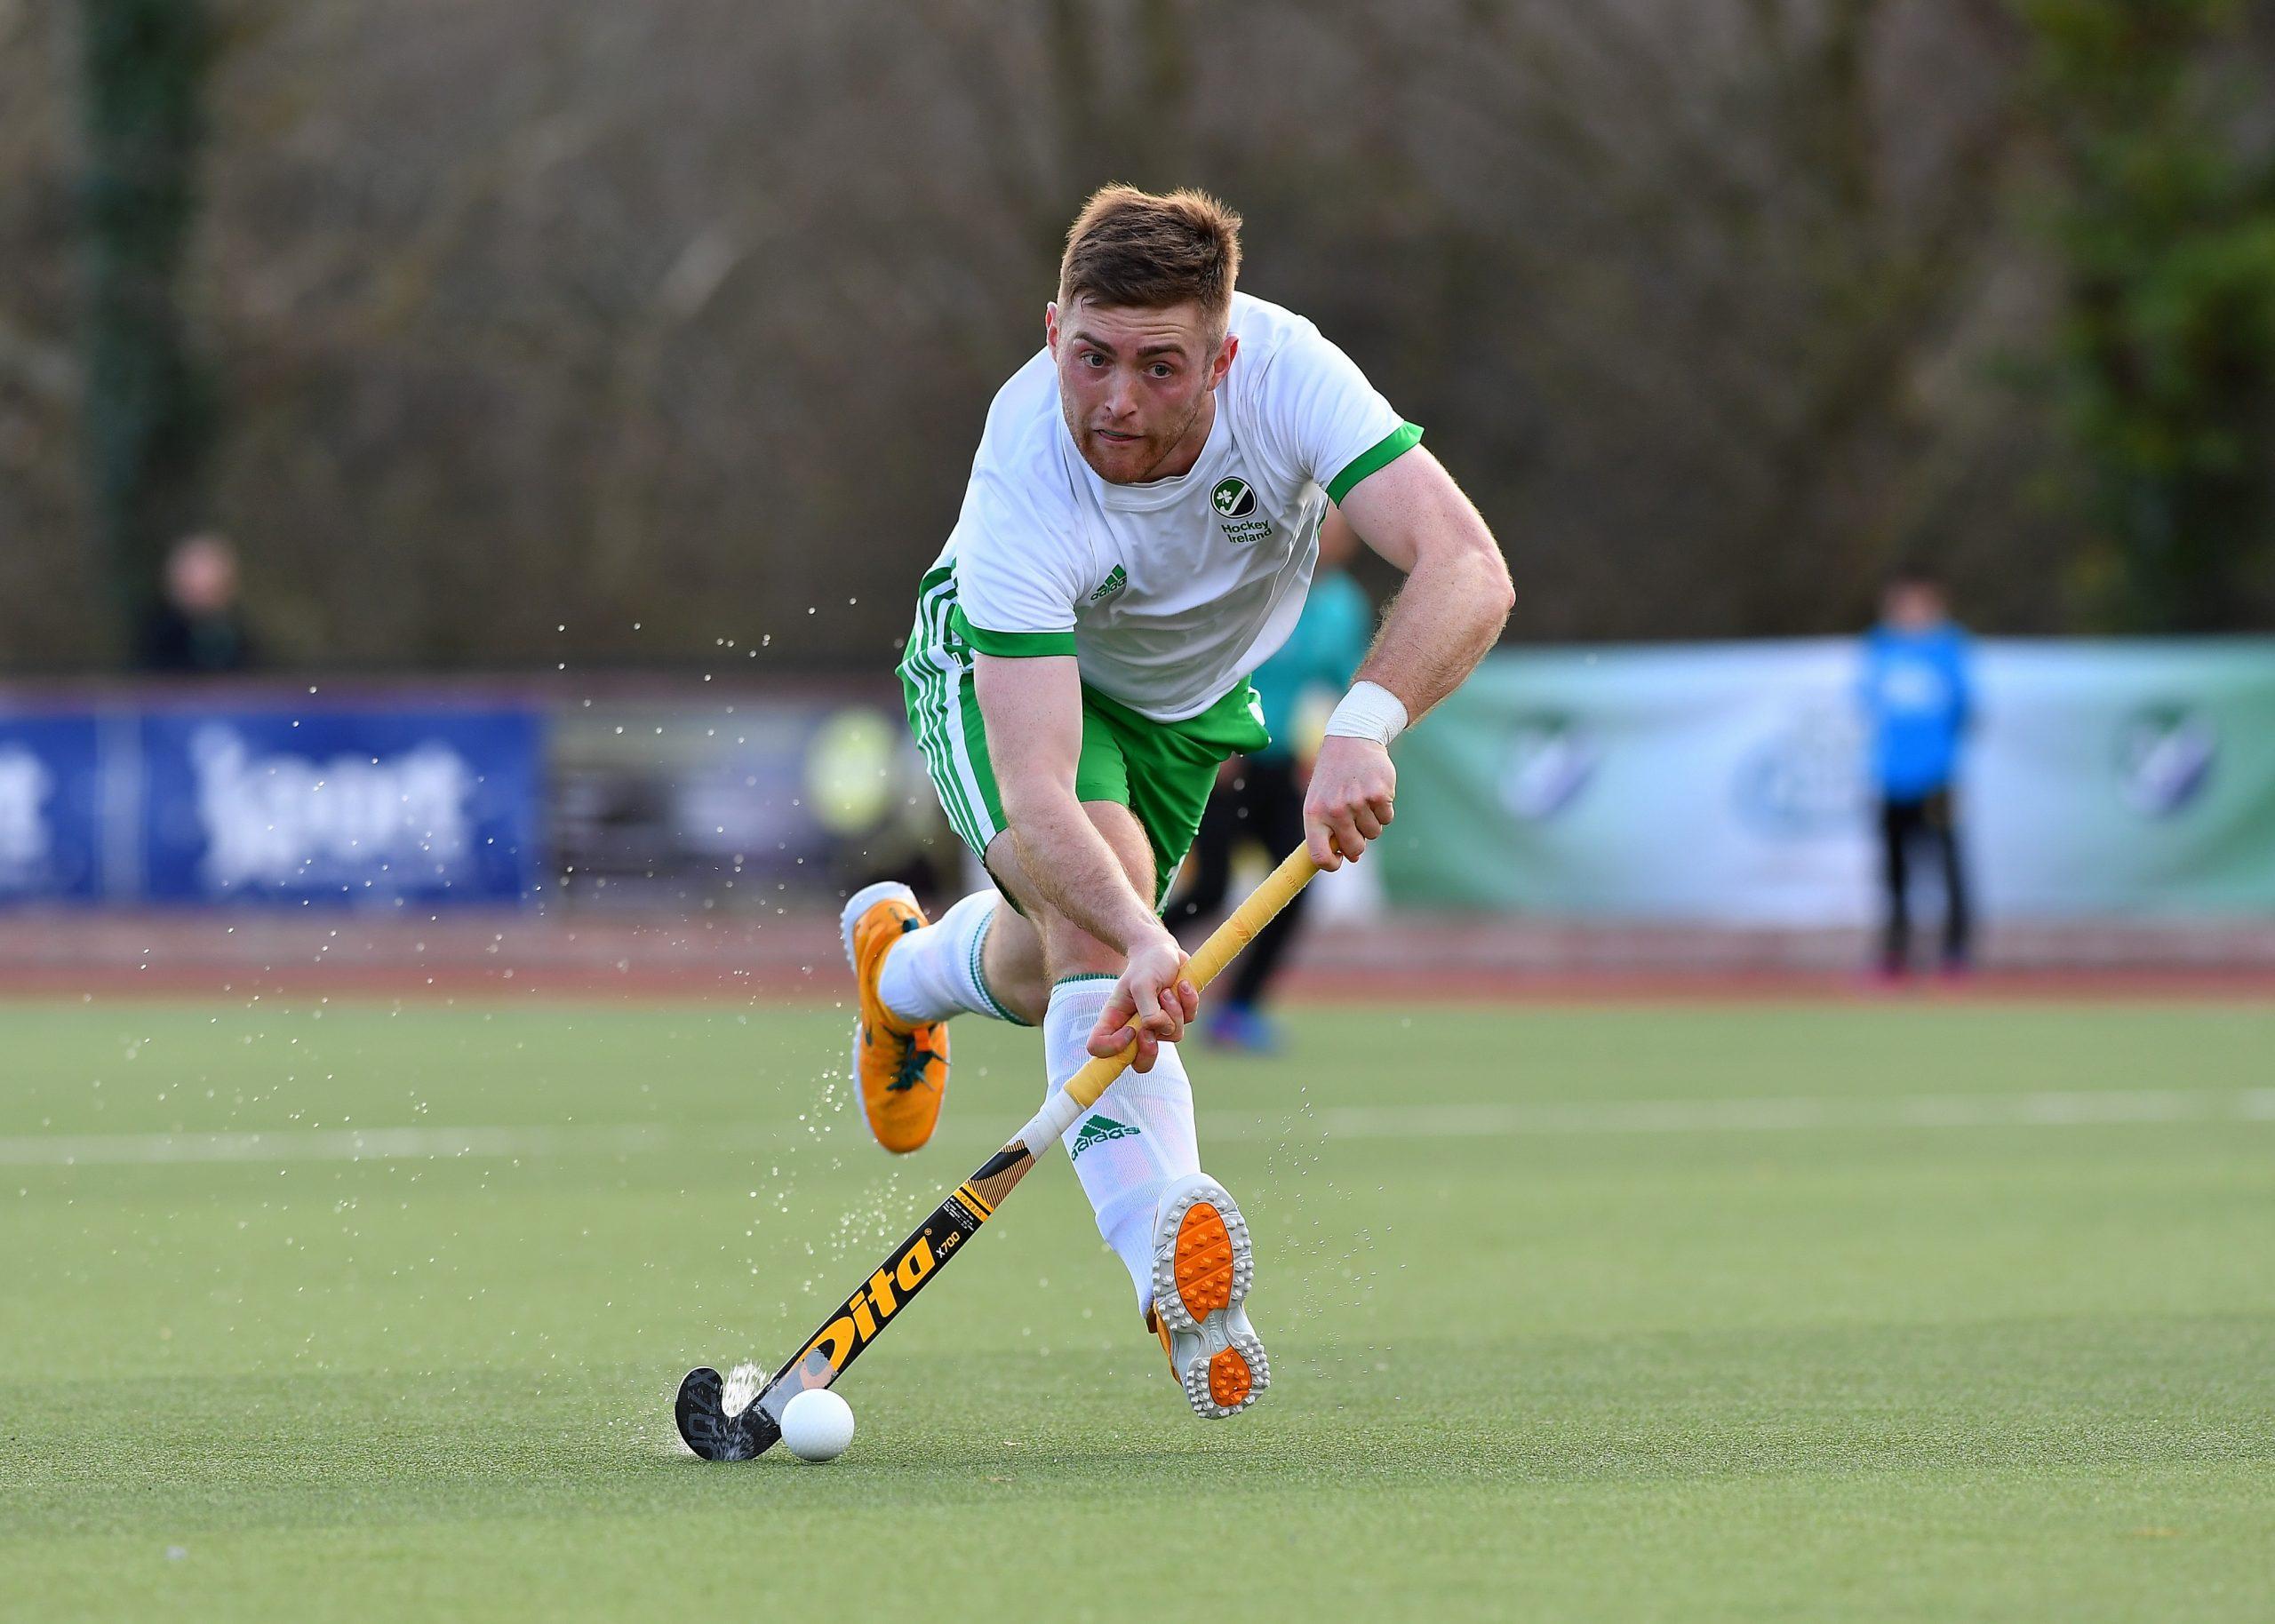 Ireland's men held to 1-1 draw by combative Italians